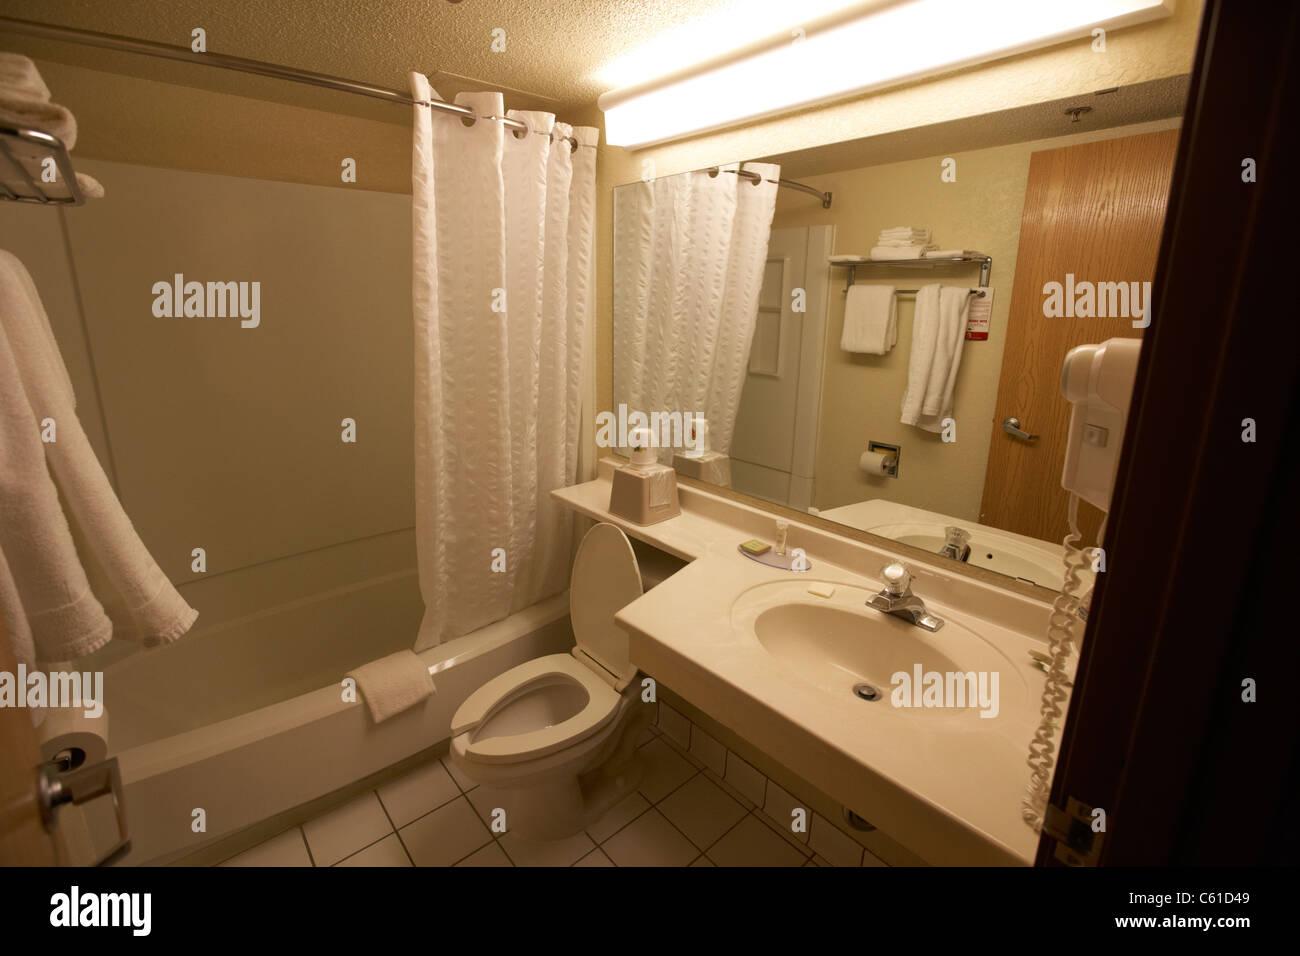 günstiges Hotel-Motel-Bad in den usa Stockbild